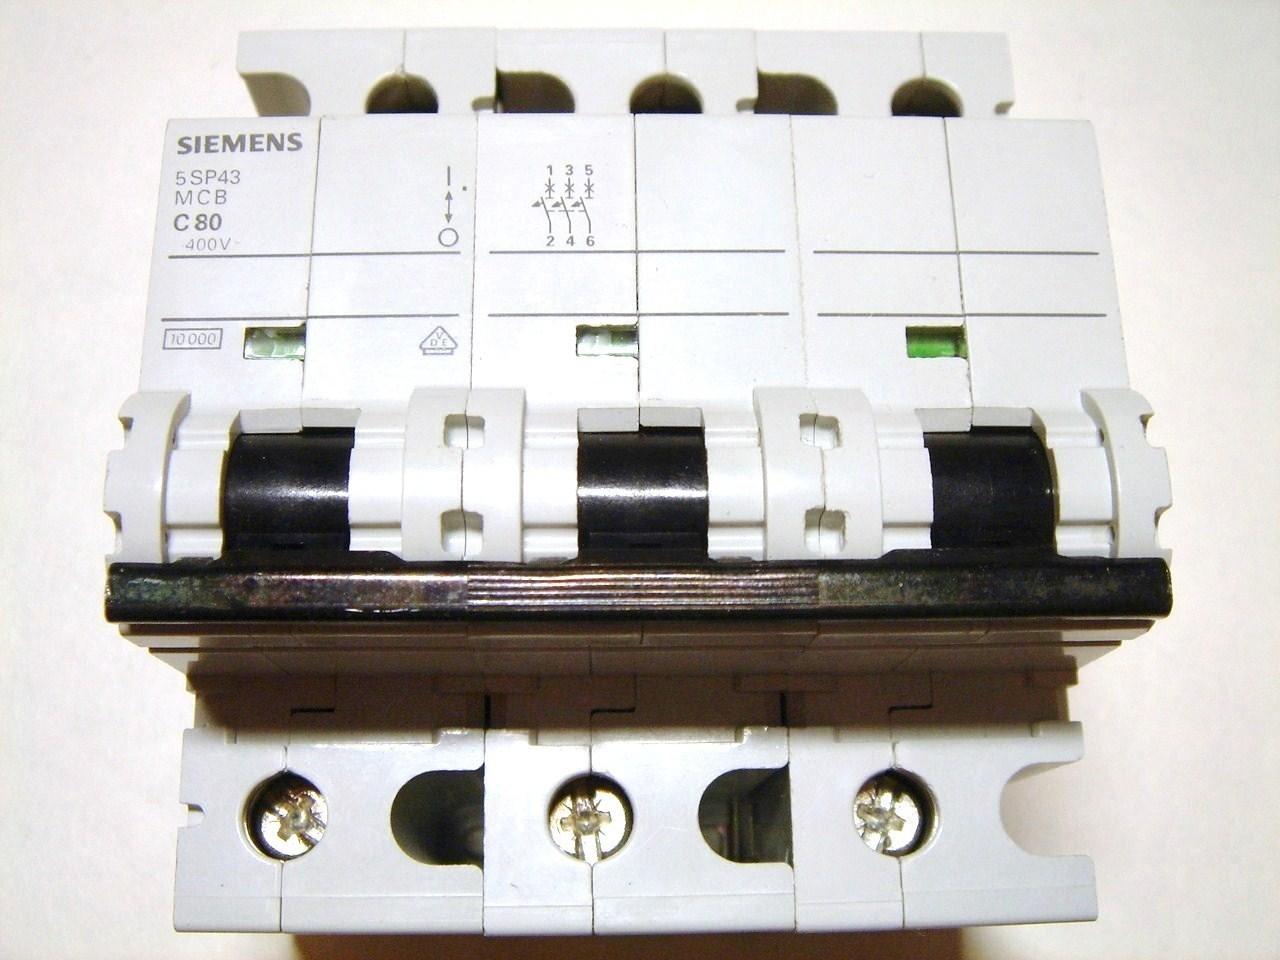 Moodulkaitselüliti 3-faasiline, C 80A, Siemens, 5SP4380-7, MCB